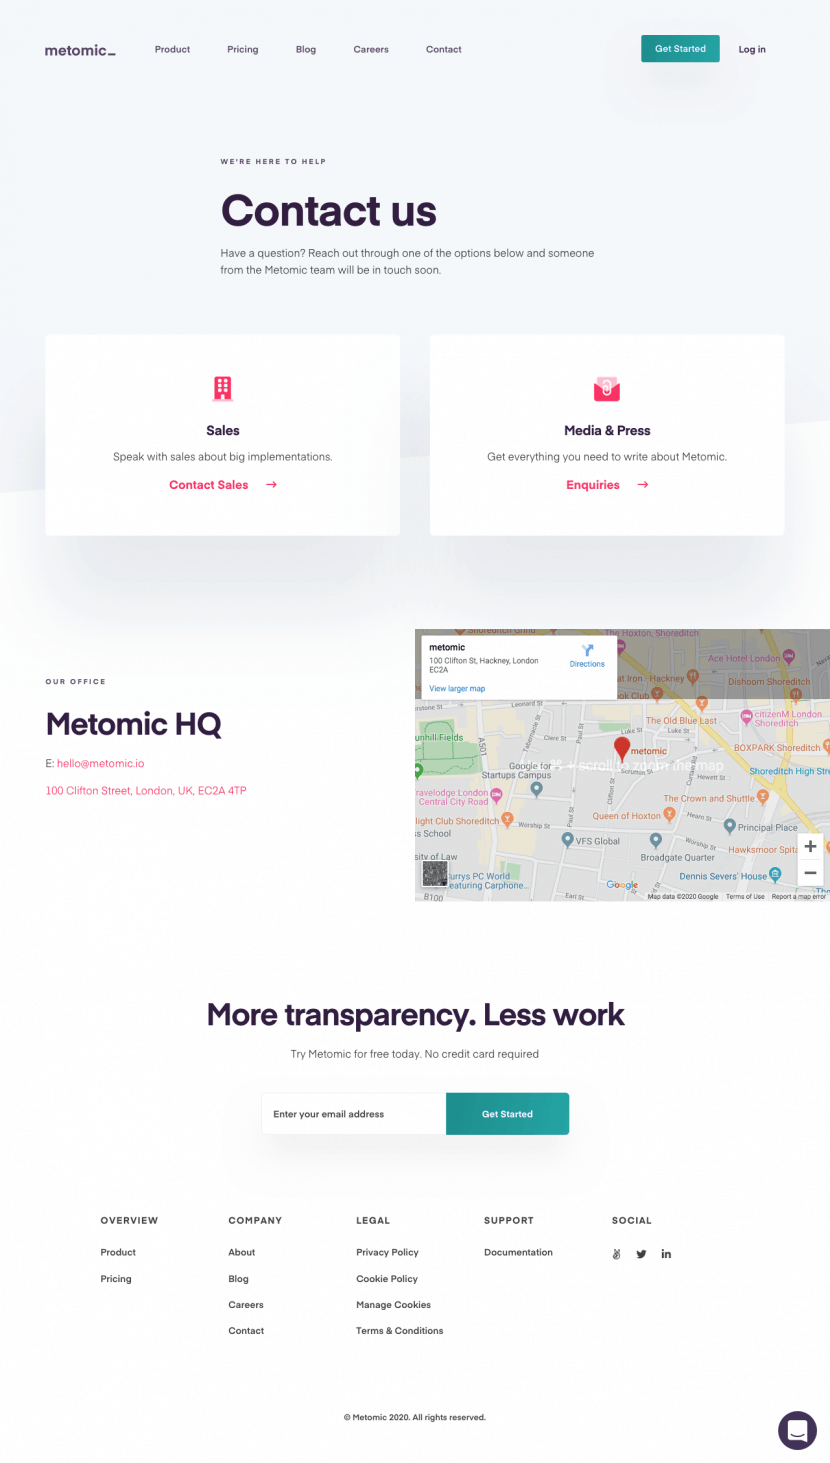 metomic-contact-us